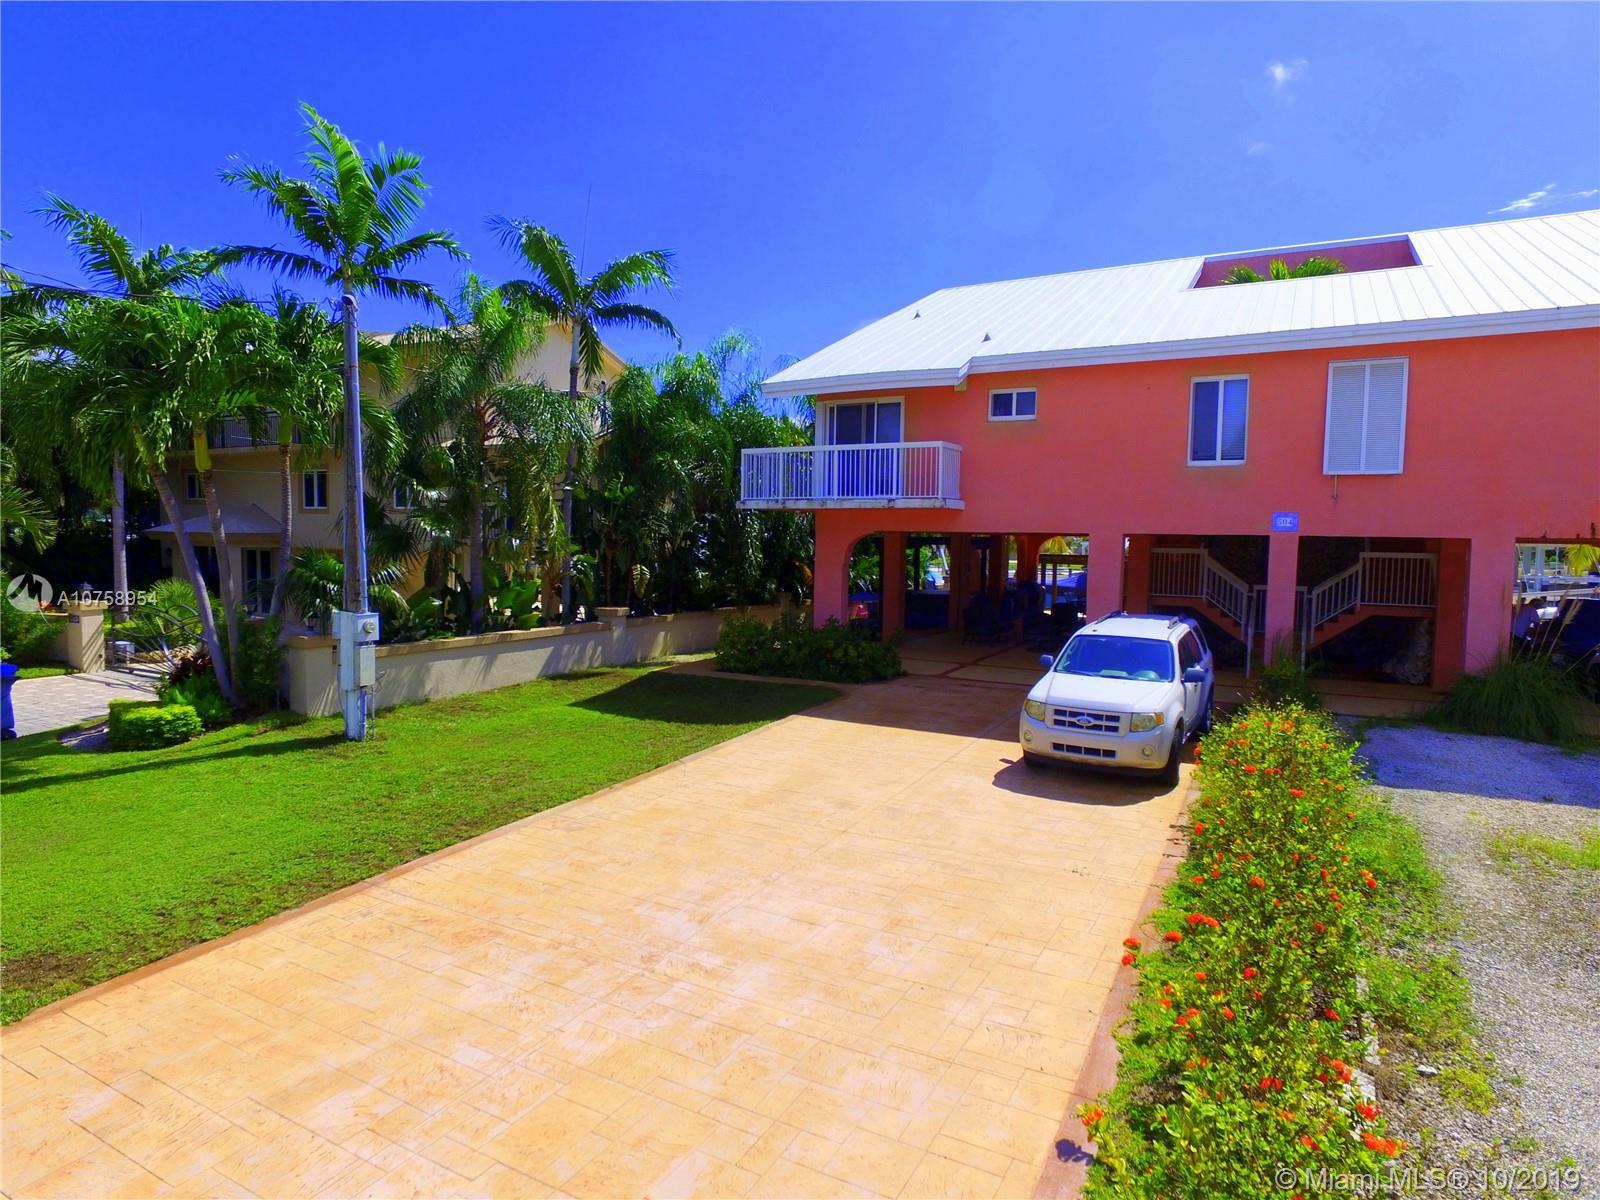 504 Caribbean Blvd #A, Other City - Keys/Islands/Caribb, FL 33037 - Other City - Keys/Islands/Caribb, FL real estate listing